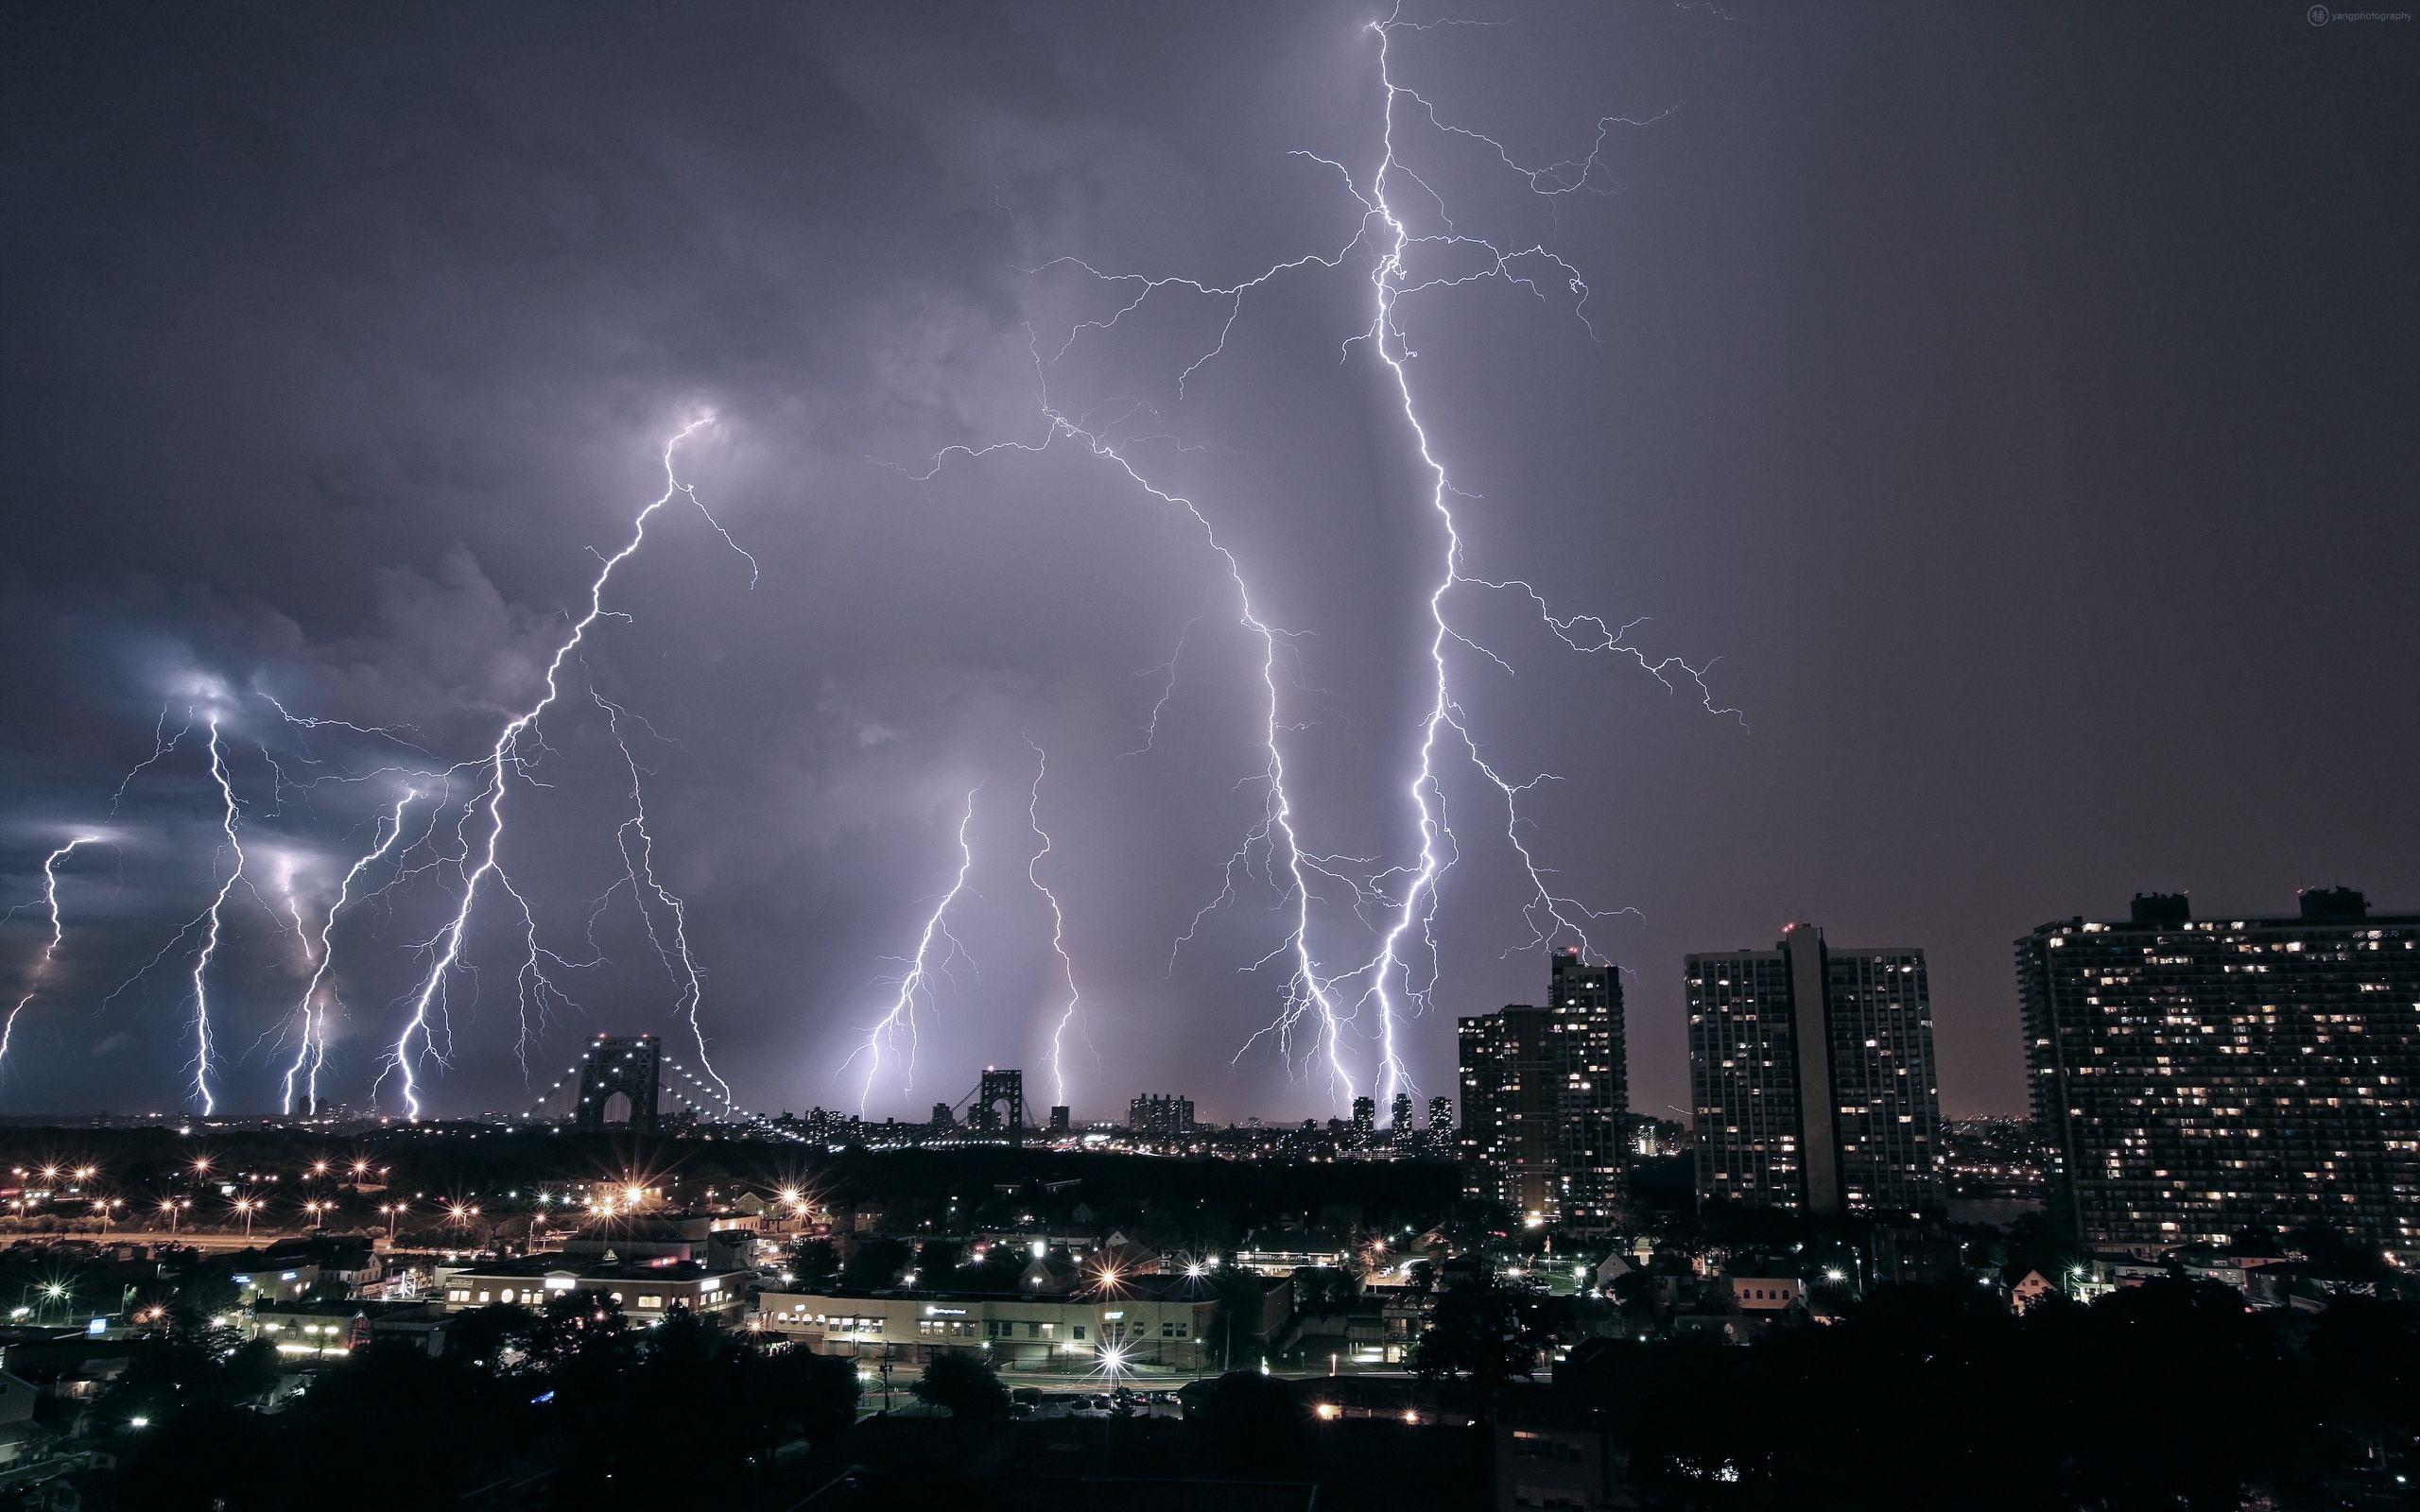 Nature Wallpaper Lightning Storm Wallpaper Phone for Desktop 2560x1600